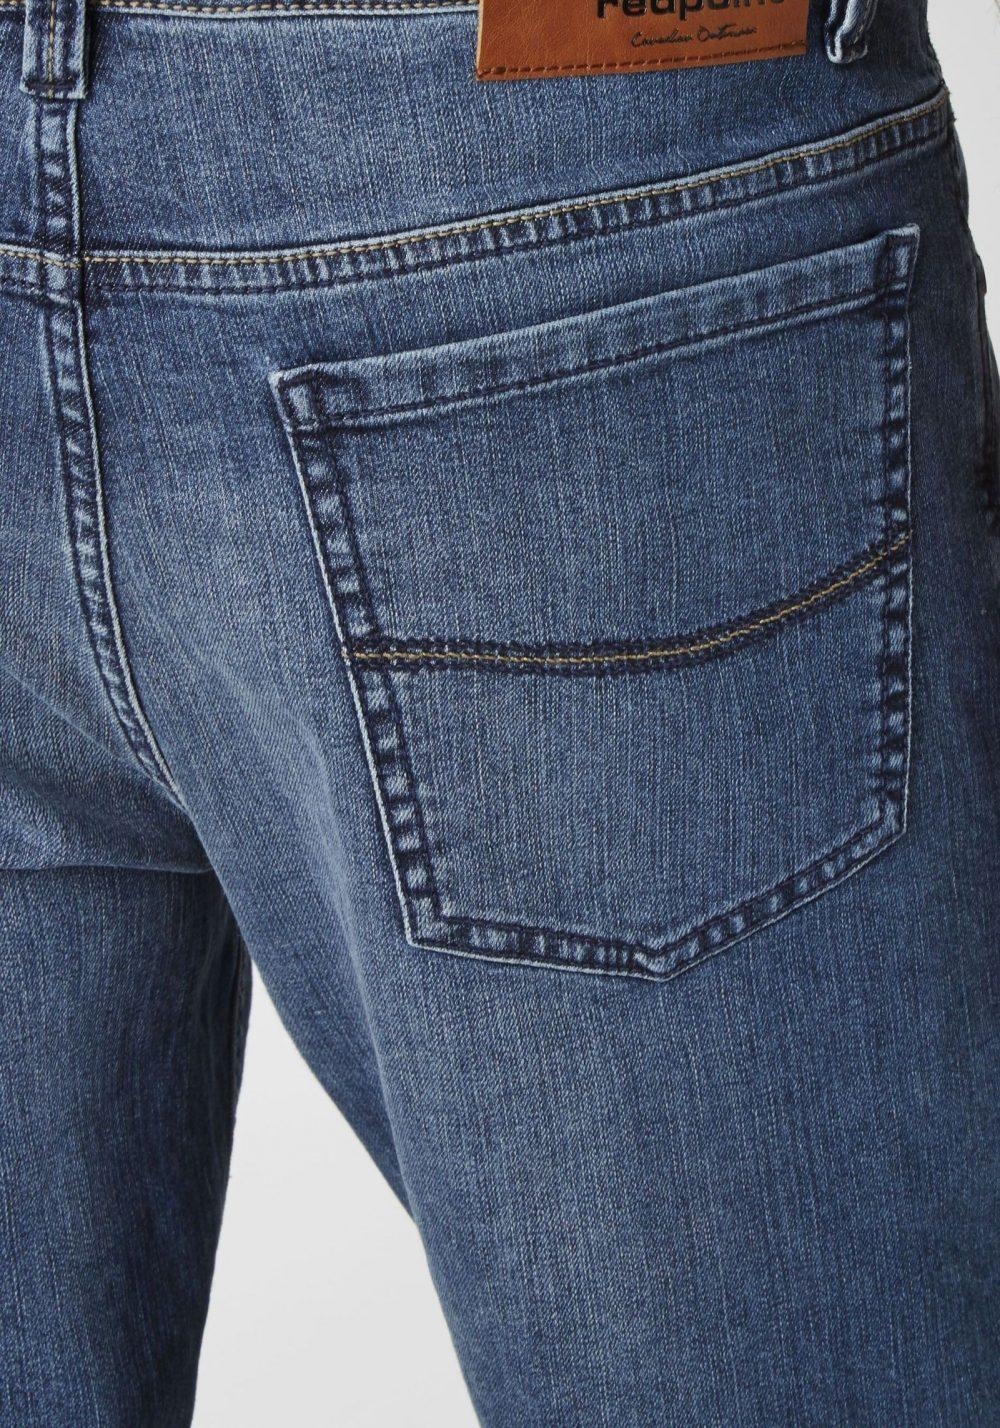 extra xxl shop, redpoint hlače veliki broj